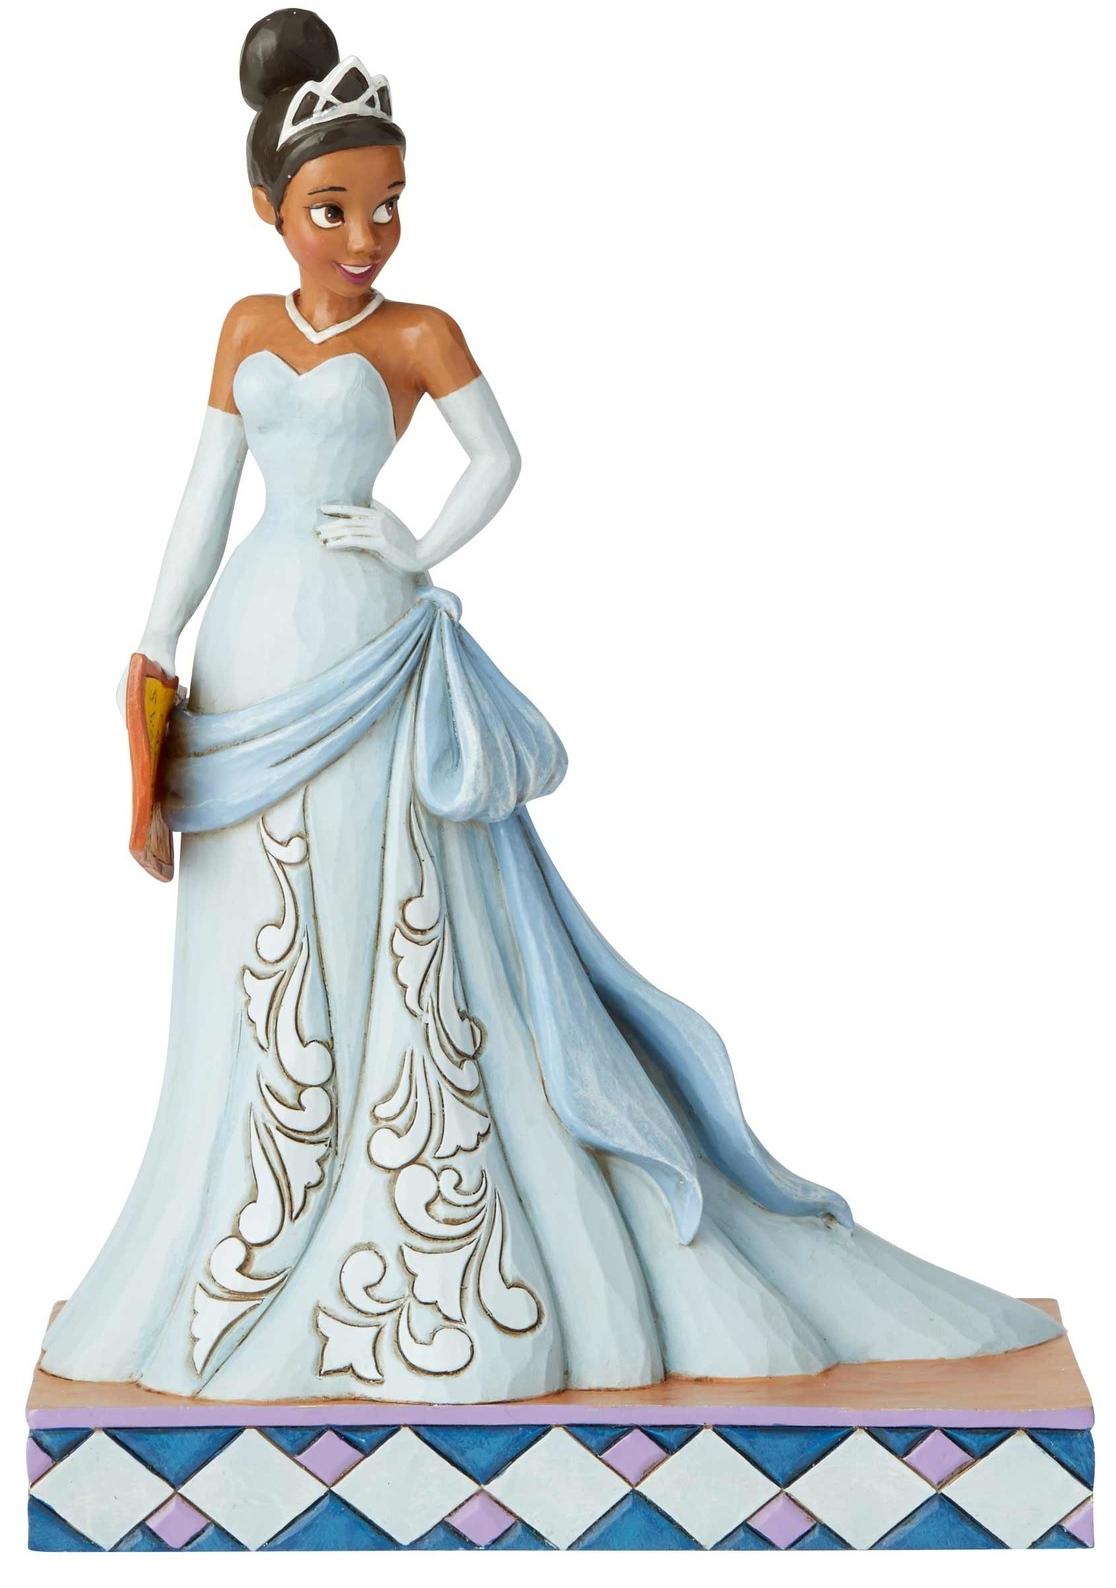 Disney Traditions by Jim Shore 6002821 Princess Passion Tiana